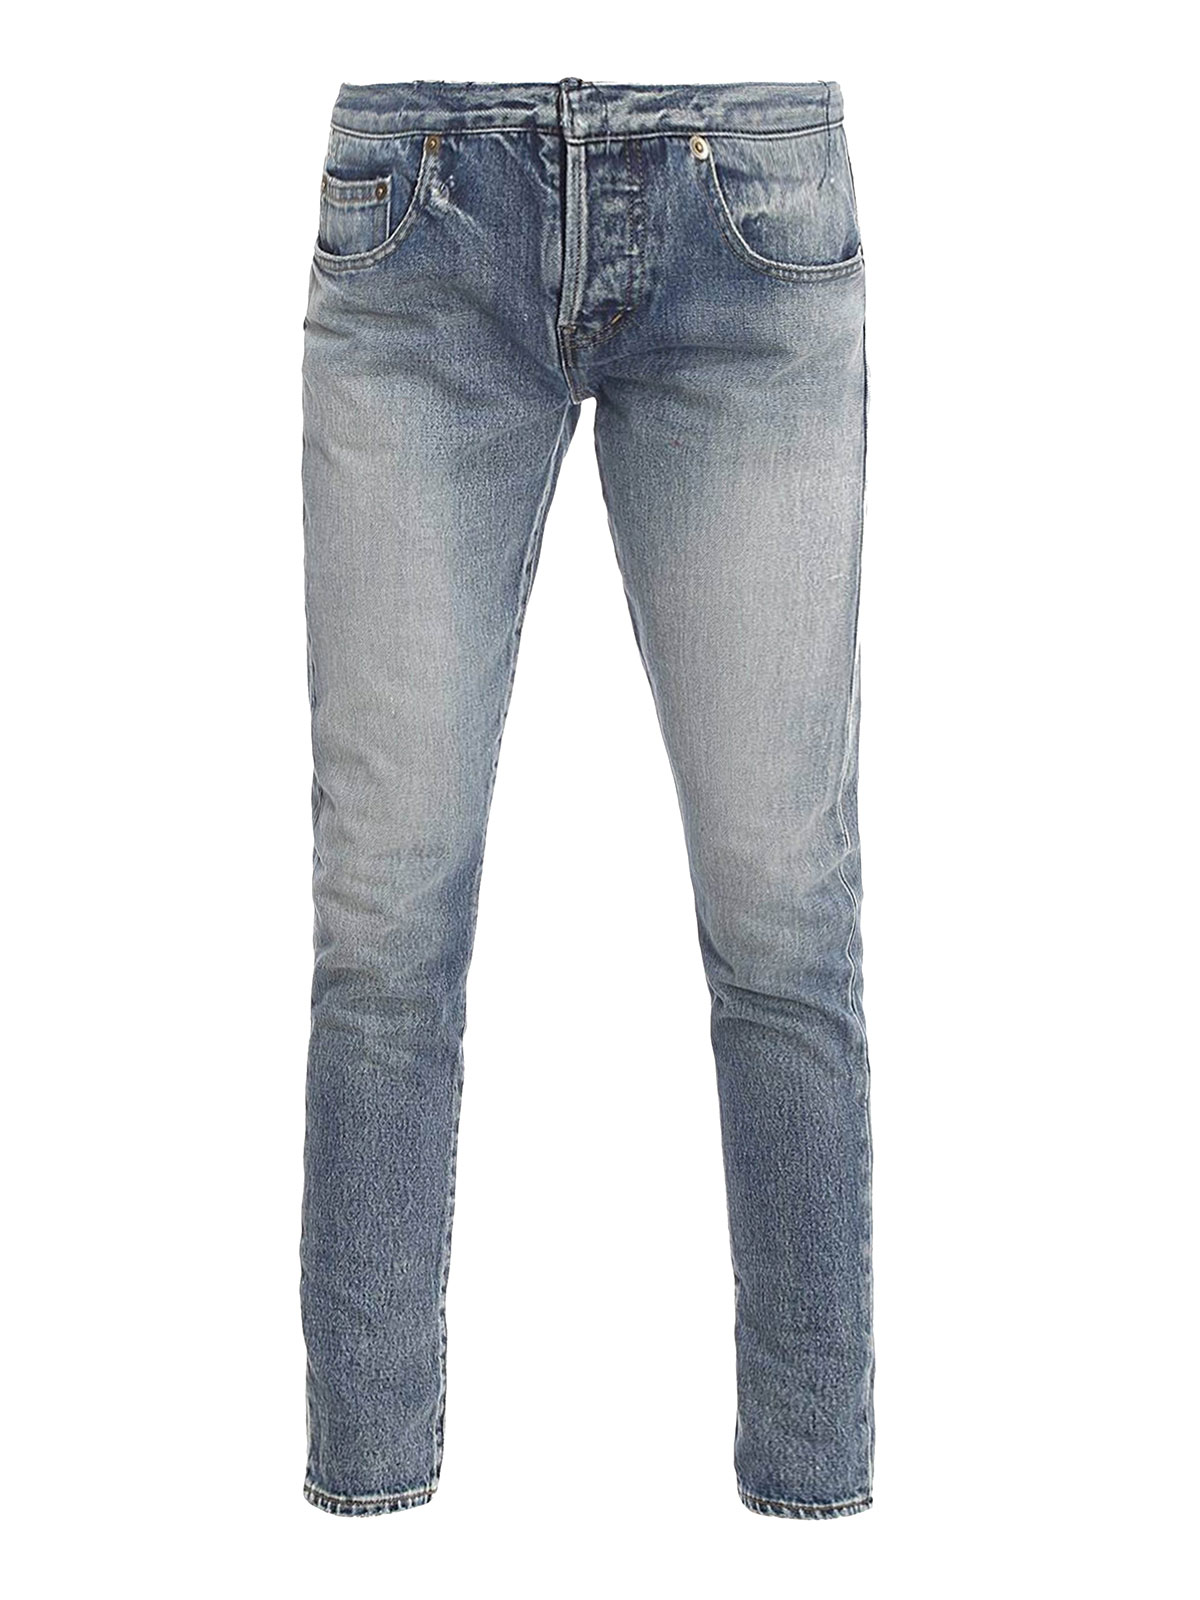 Laurent Jeans Effetto Saint Boyfriend Vintage 428023 g7yvYf6b